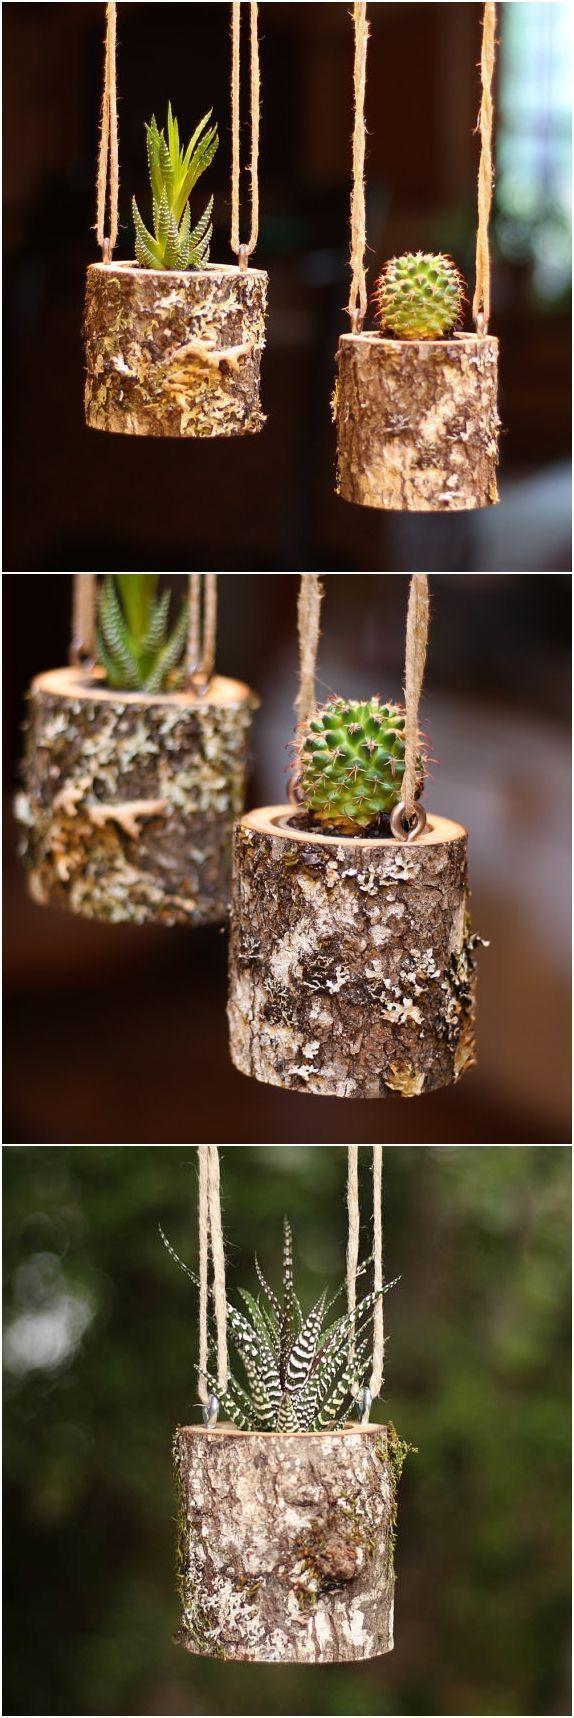 Haus Erwärmung Geschenk Pflanzer Hängen Pflanzer Rustikal Hängen Sukkulente